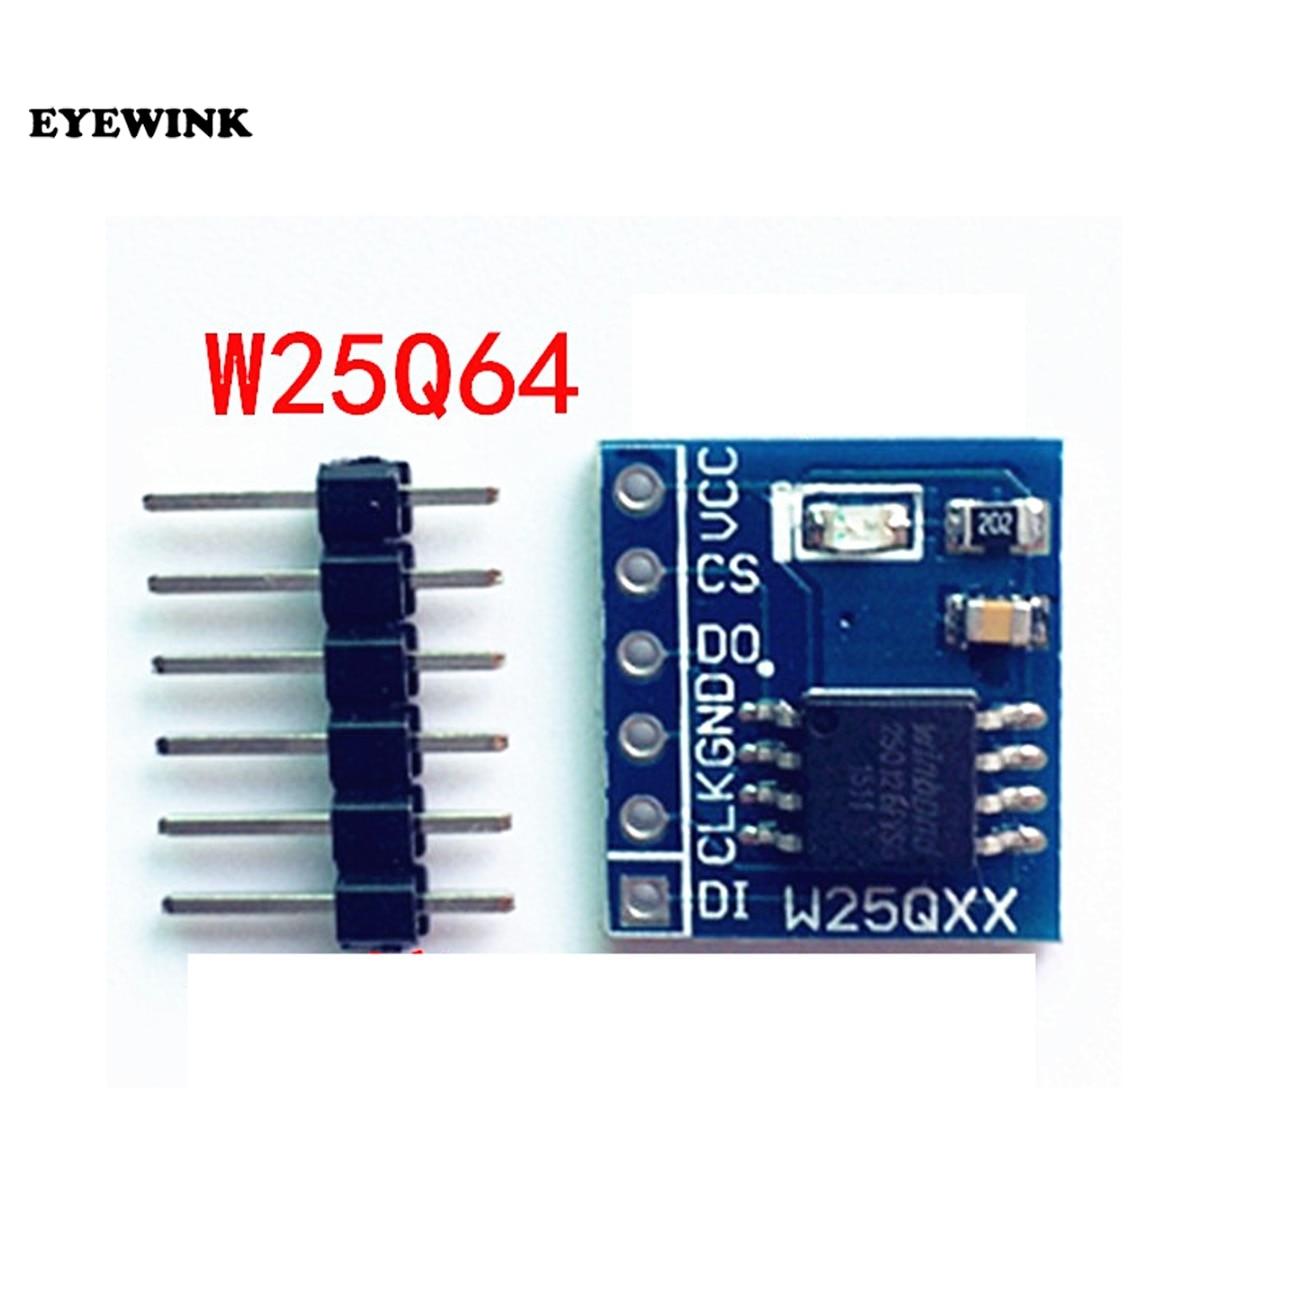 W25Q32 W25Q64 W25Q128 módulo de almacenamiento FLASH de gran capacidad interfaz SPI BV FV código STM32